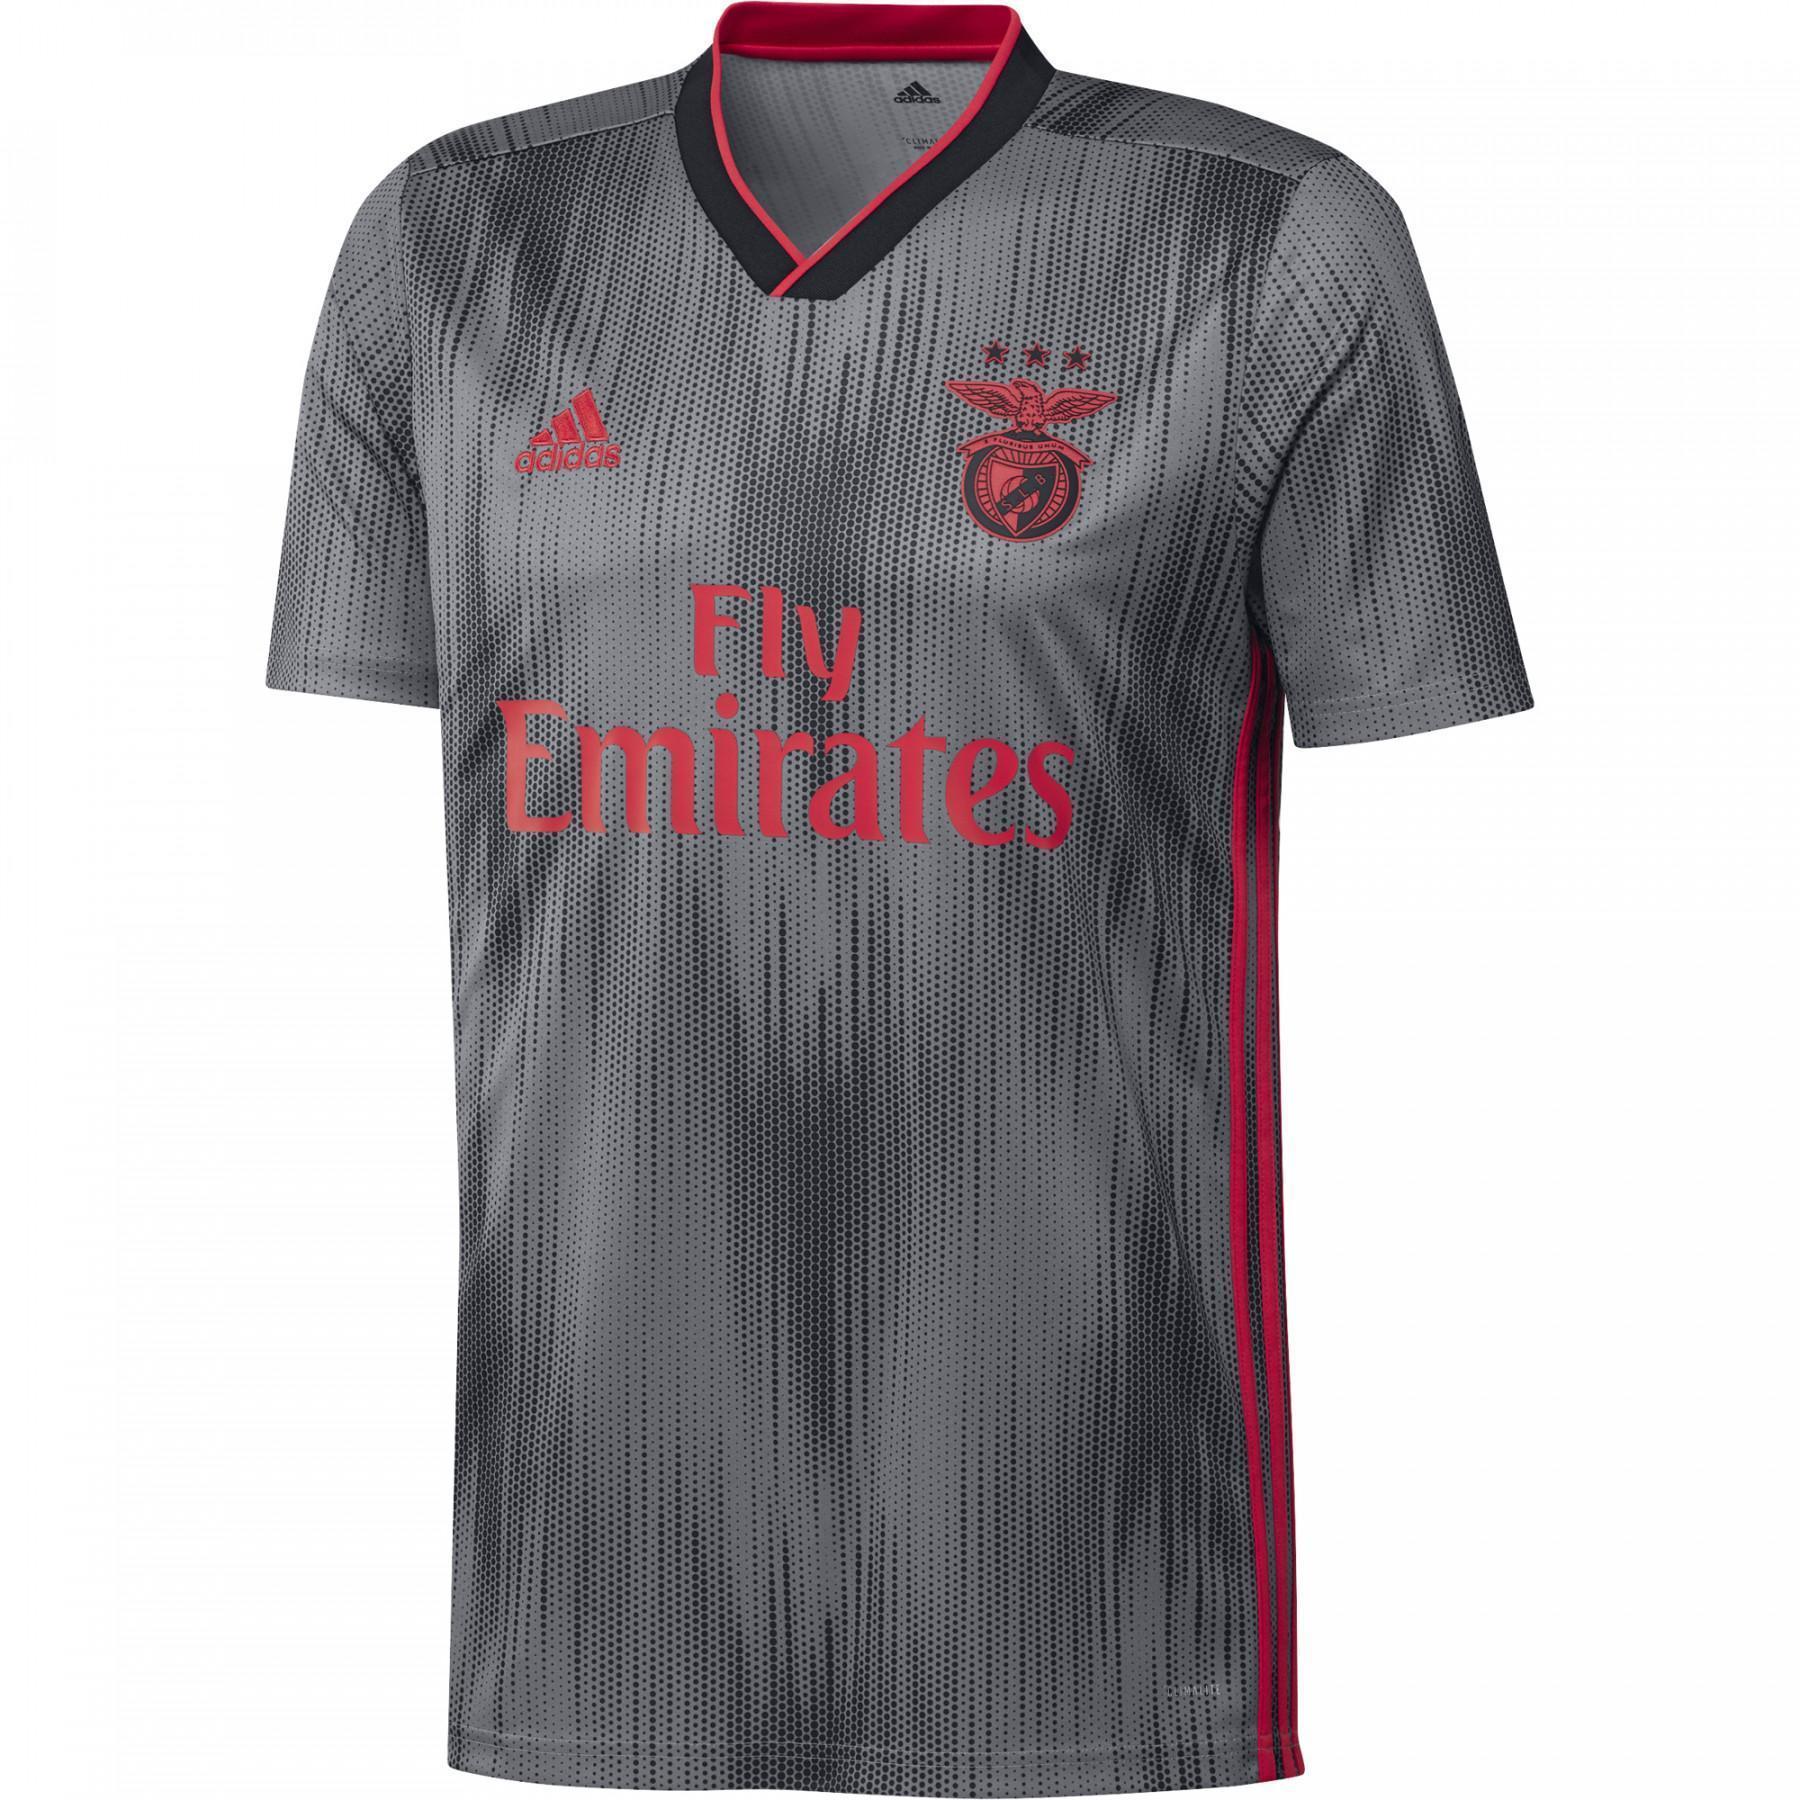 Away Shirt 2019/20 Benfica